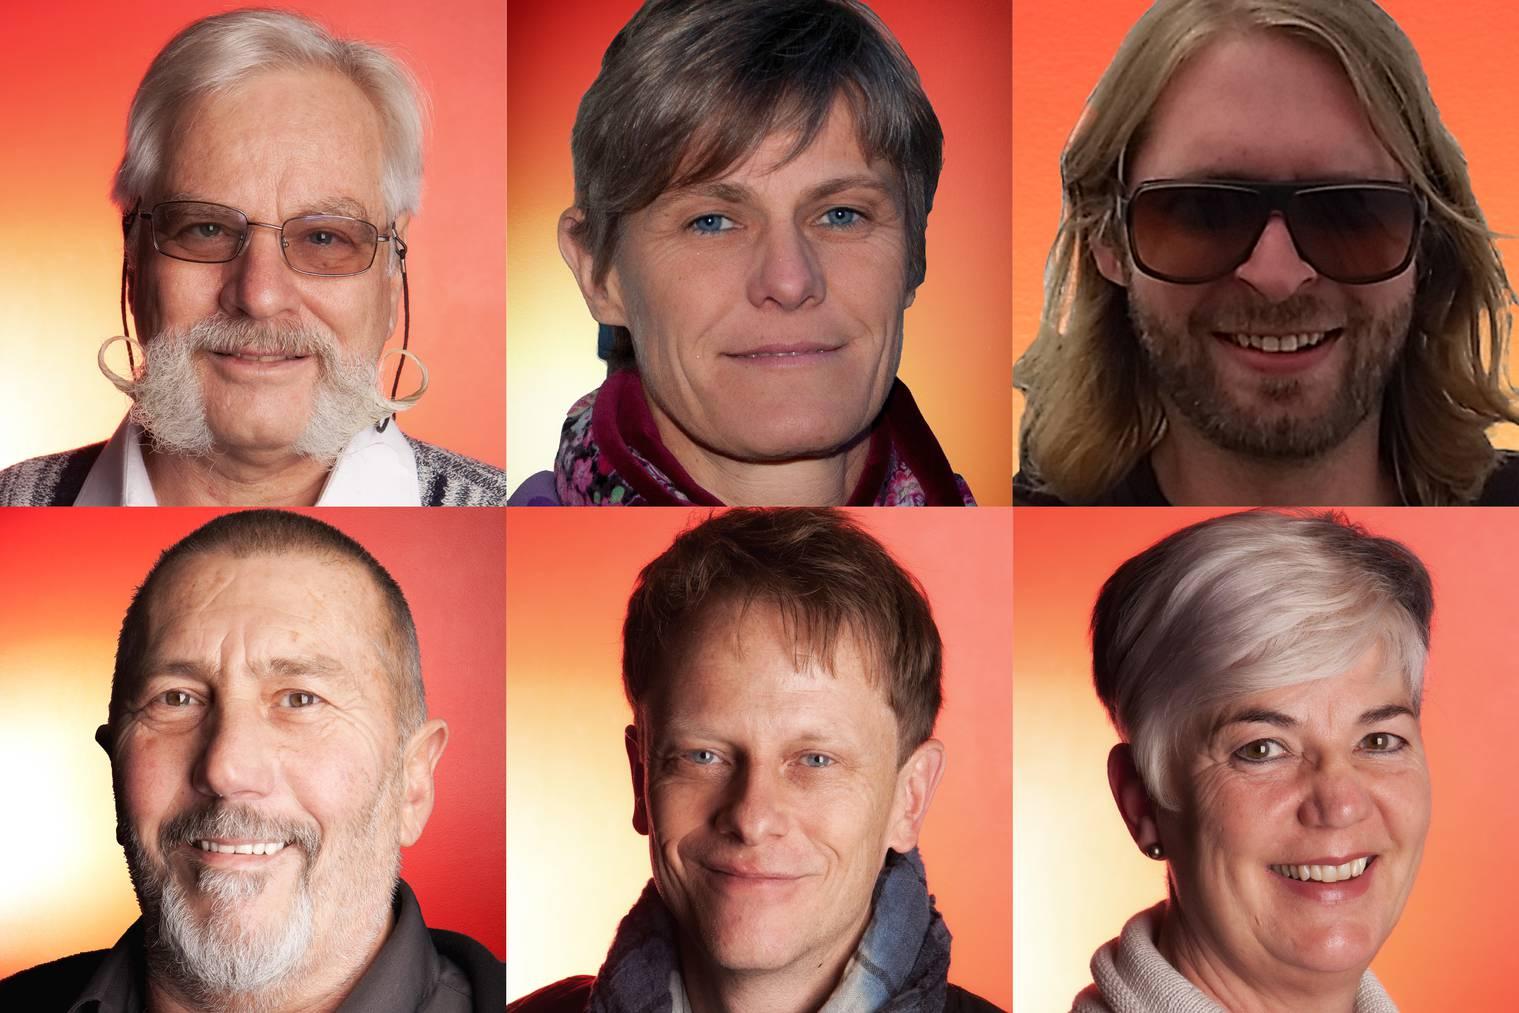 Alle Kandidaten für den Rüüdigen Lozärner 2014. Vinzenz Eggermann, Sabine Hediger, Philipp Hüsler, Kurt Käppeli, Patrick Ottiger und Luitgardis Sonderegger (v.l.o.n.r.u.)